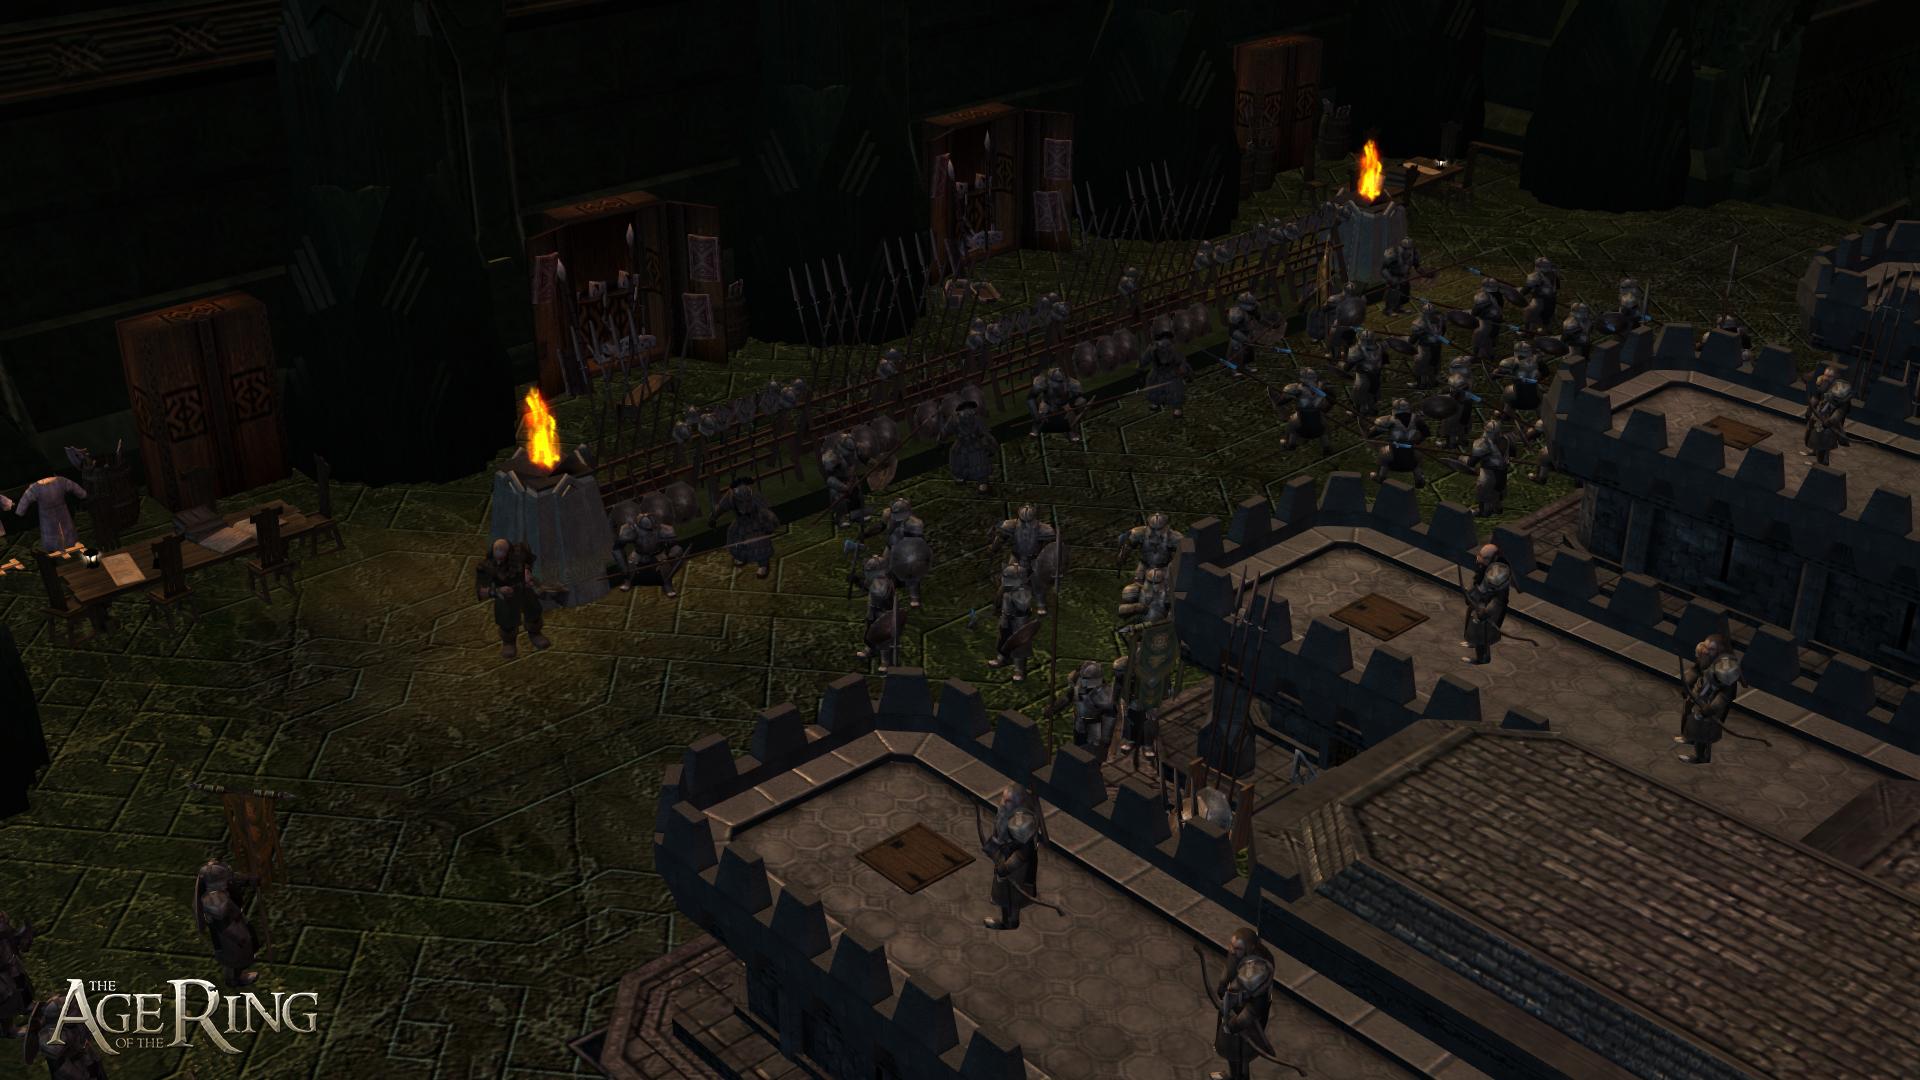 armoury of Erebor